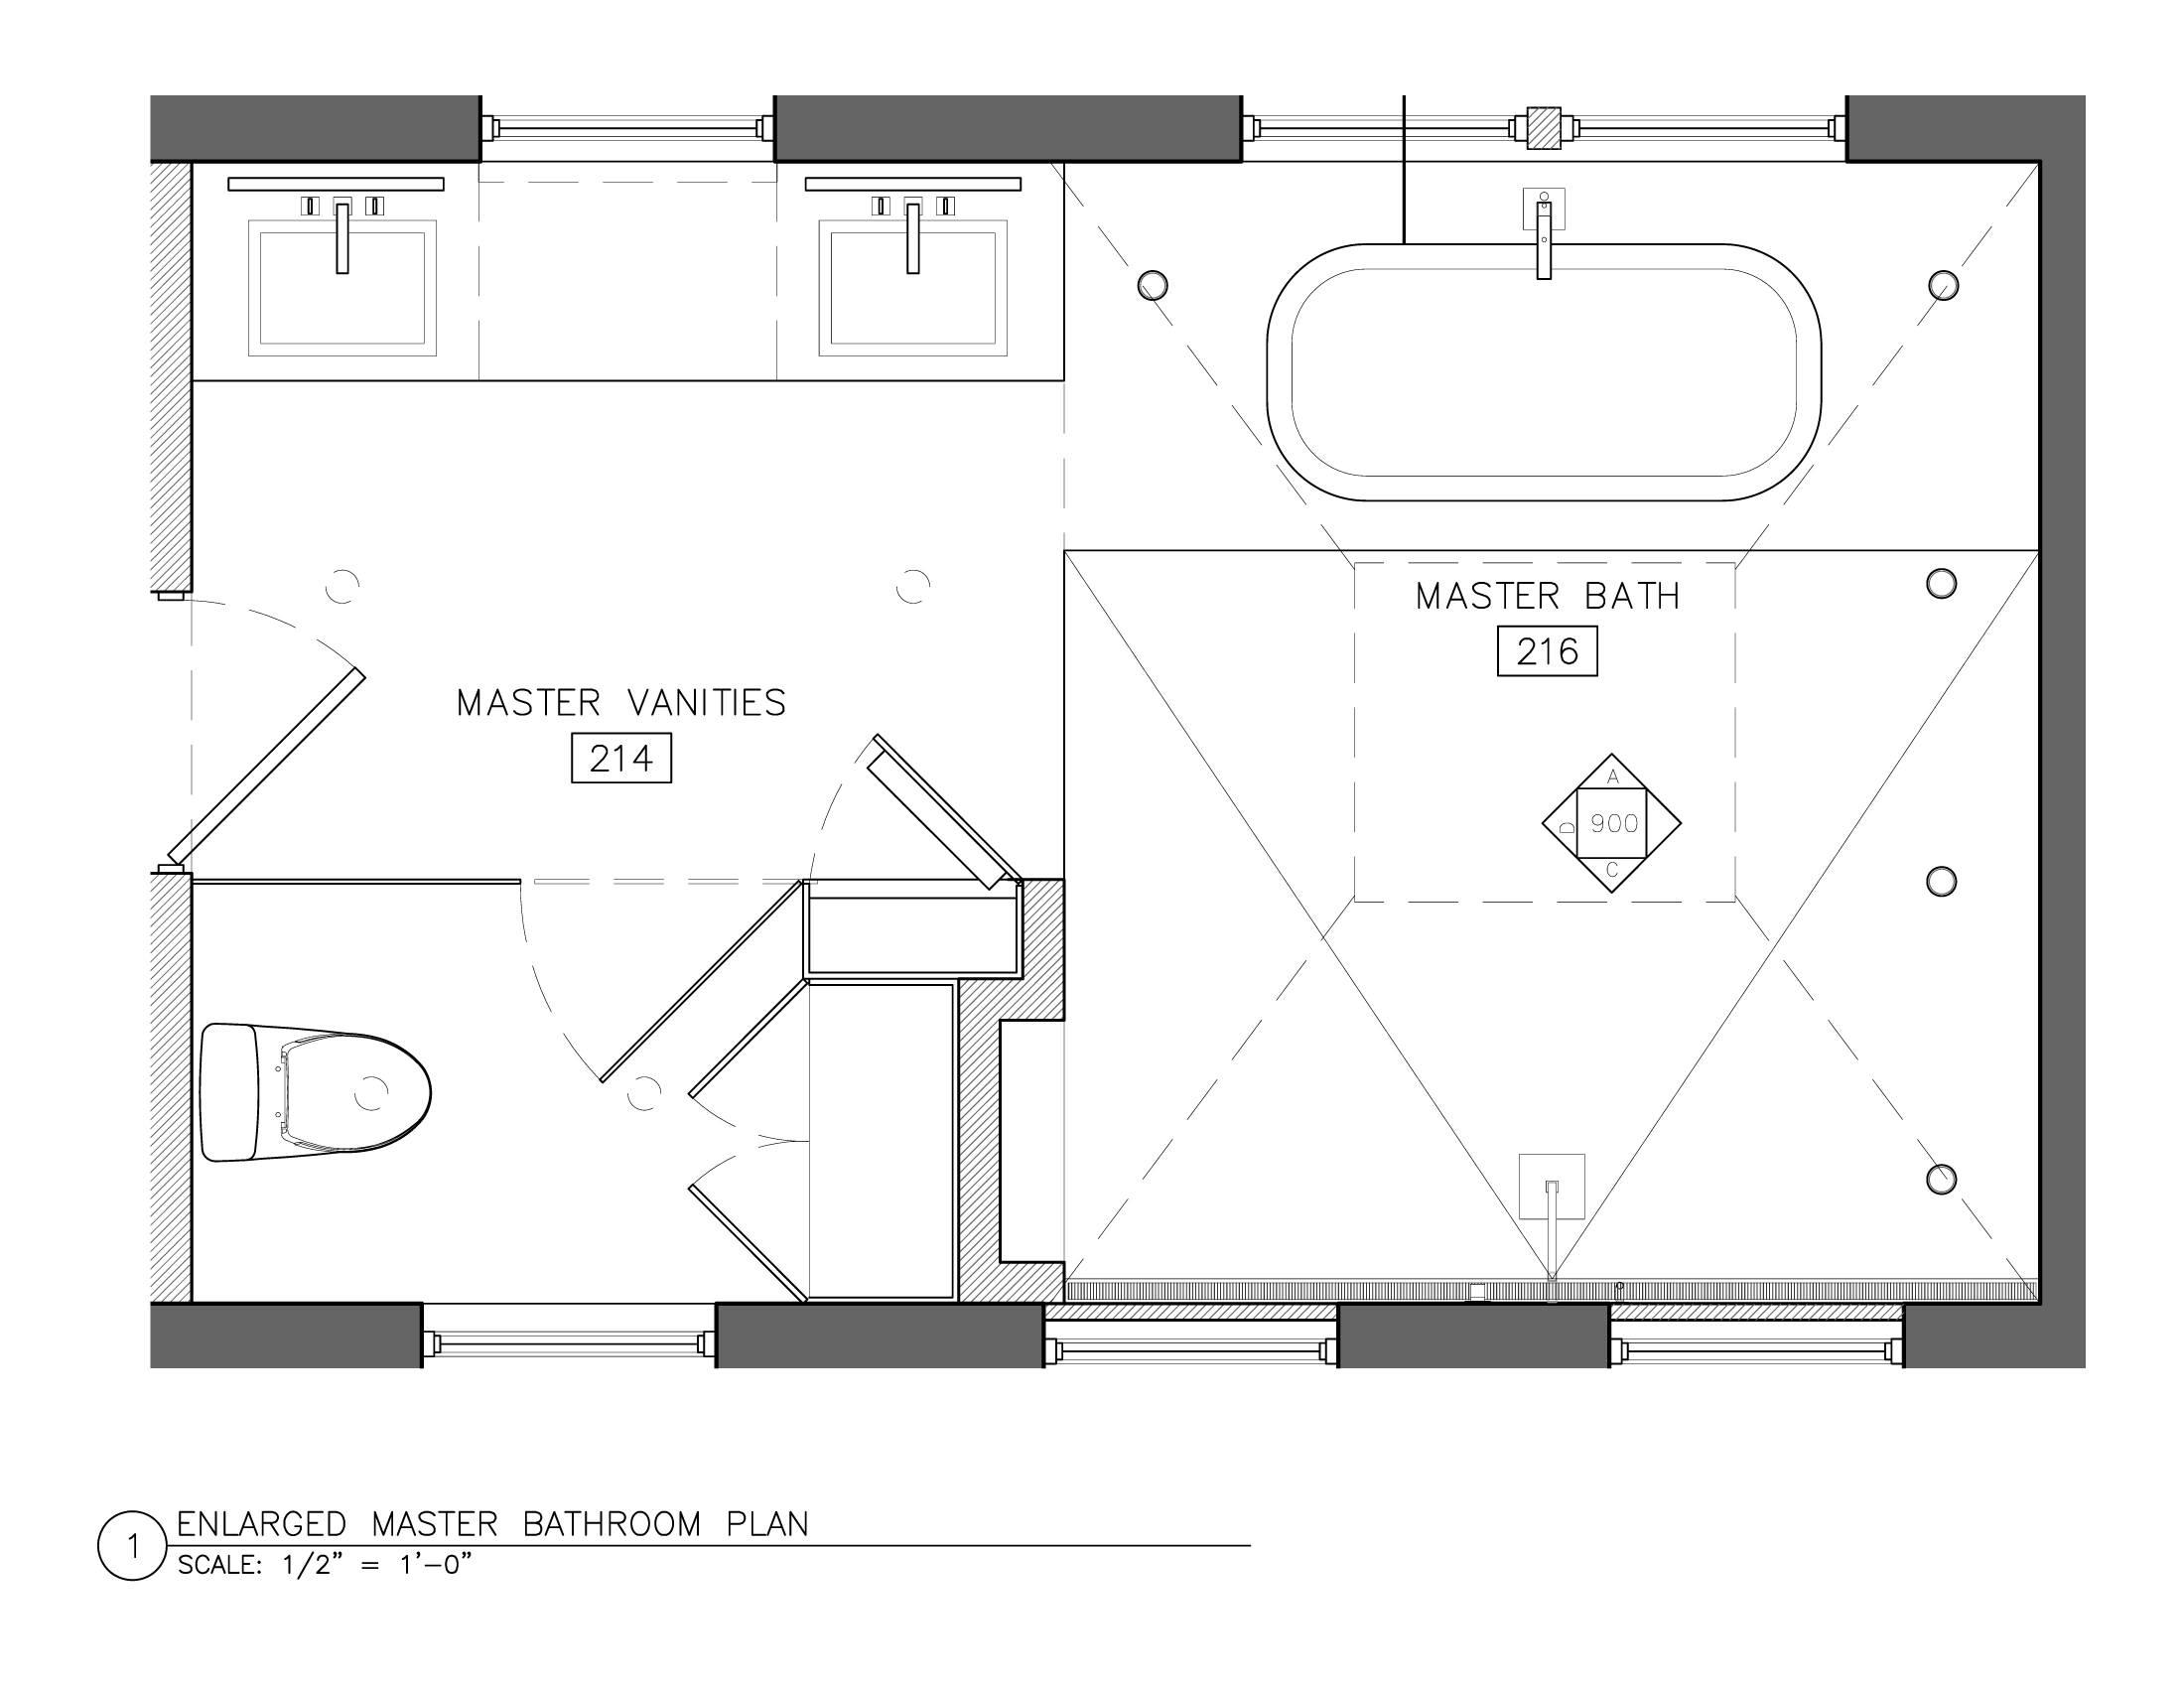 Master Bathroom Plan House Plans 75682, Small Master Bathroom Floor Plans